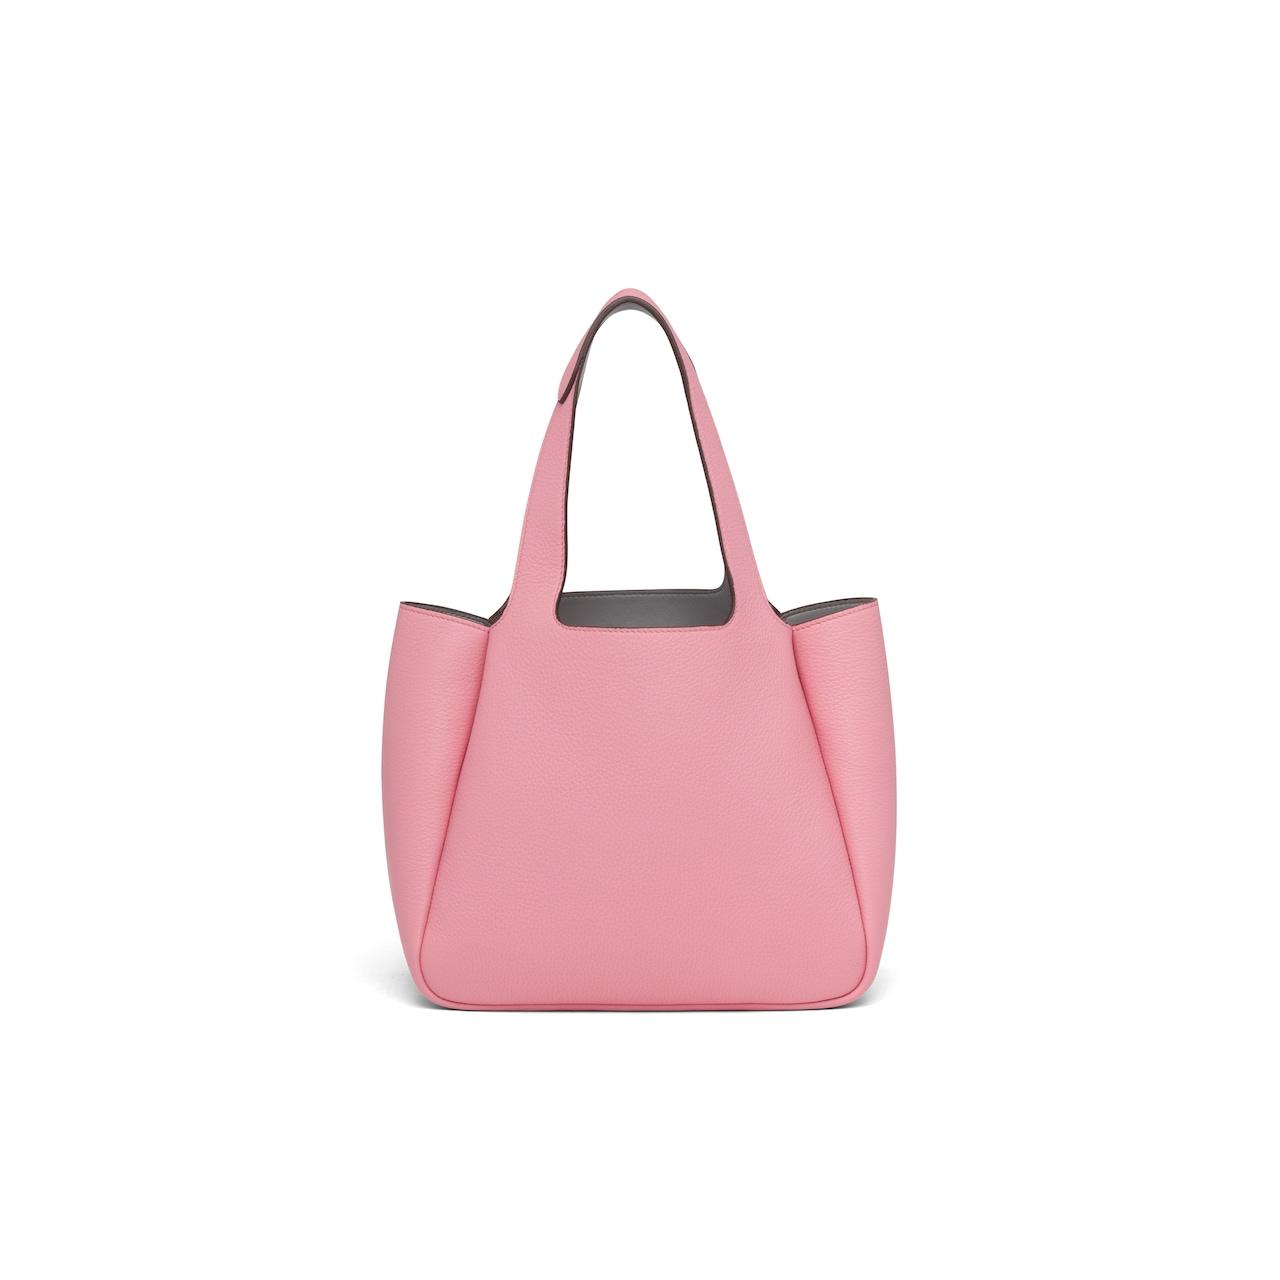 Prada Leather handbag 4